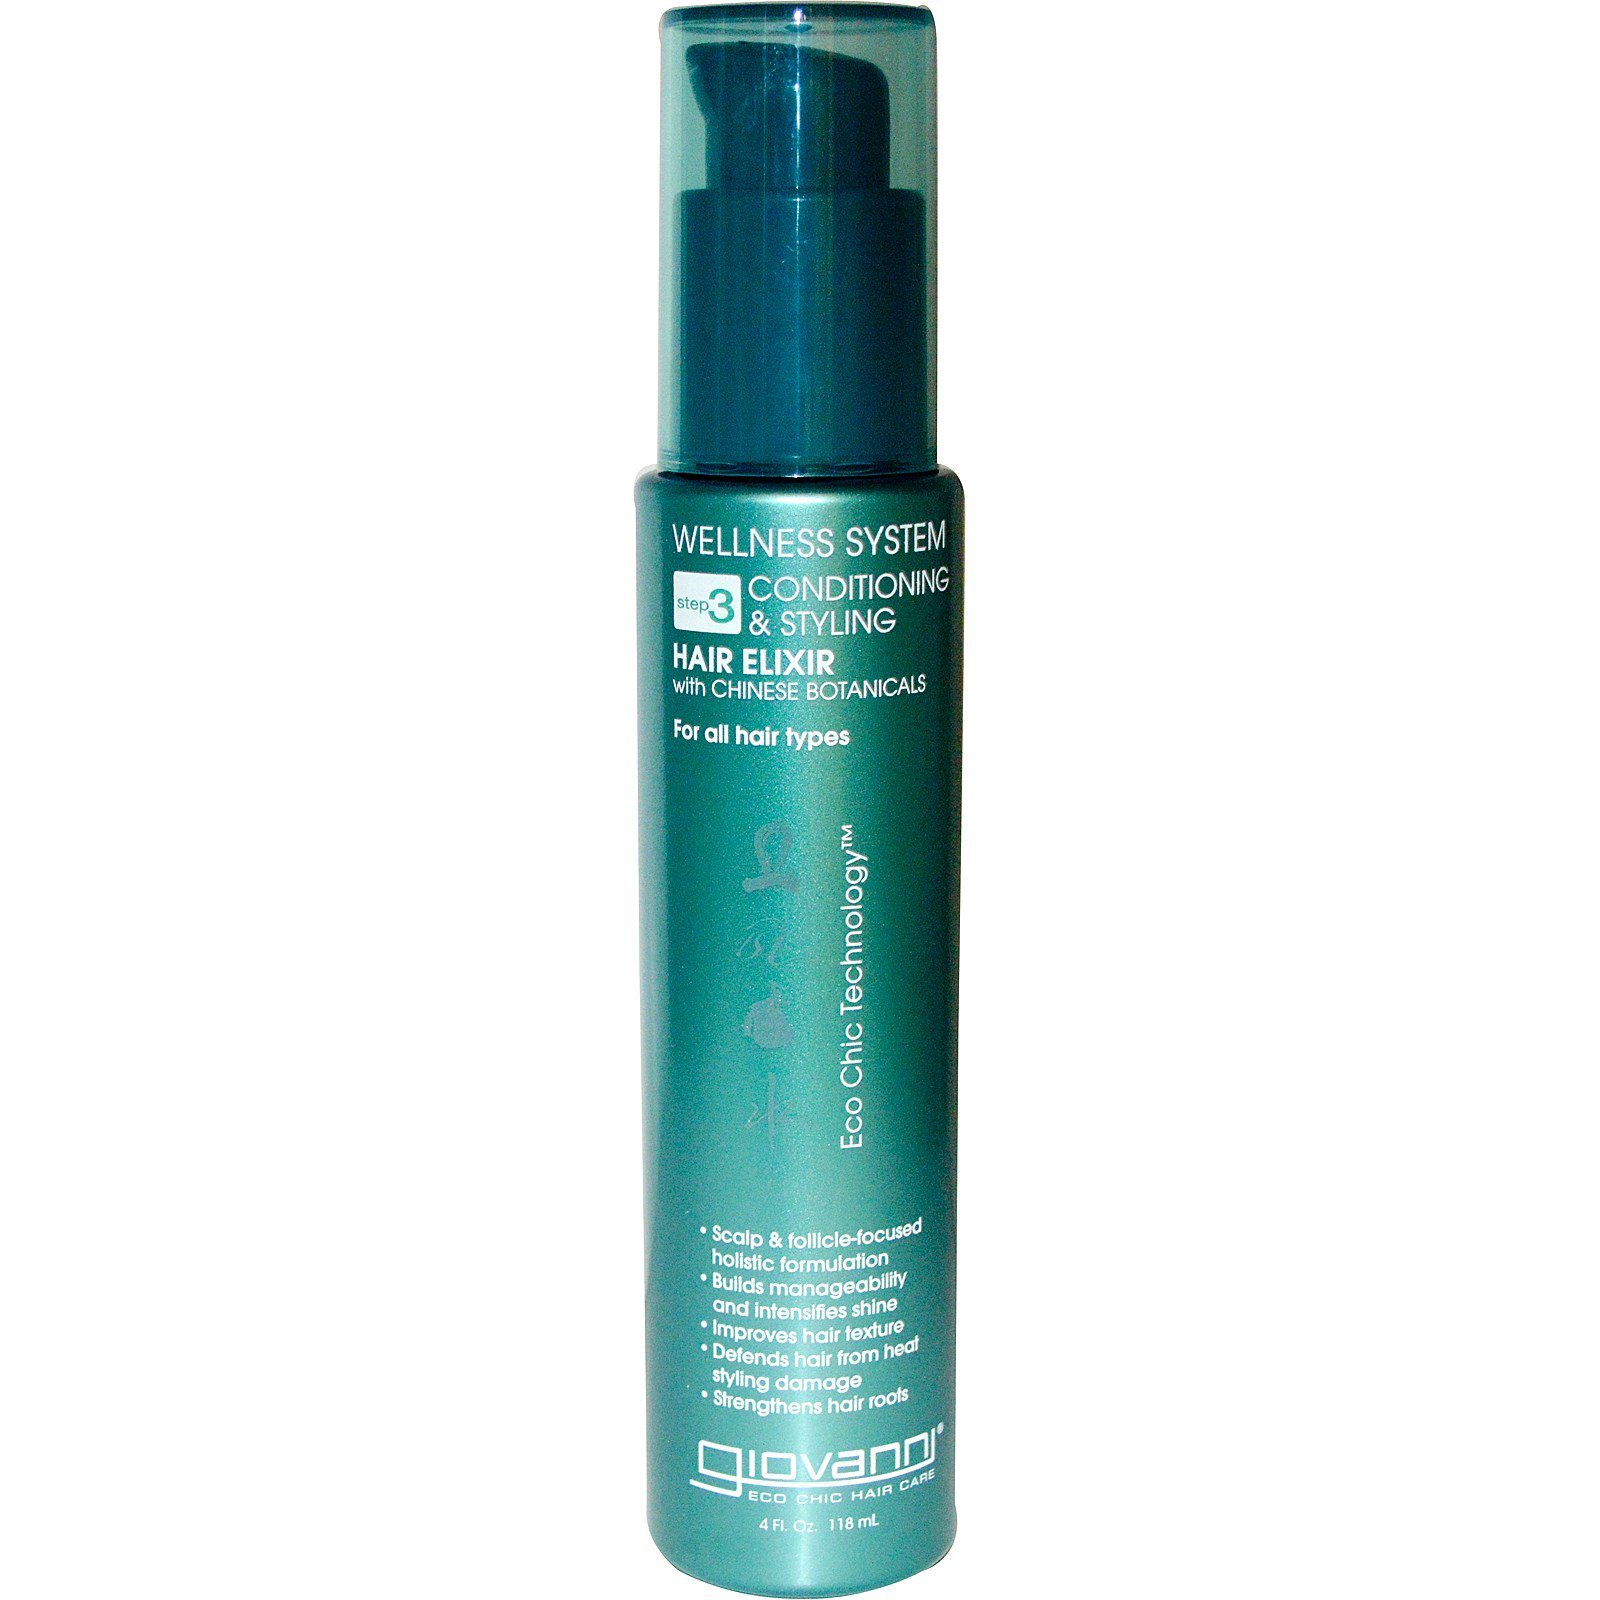 Giovanni, Wellness System, Шаг 3 — ухаживающий эликсир для укладки волос, 4 жидких унций (118 мл)